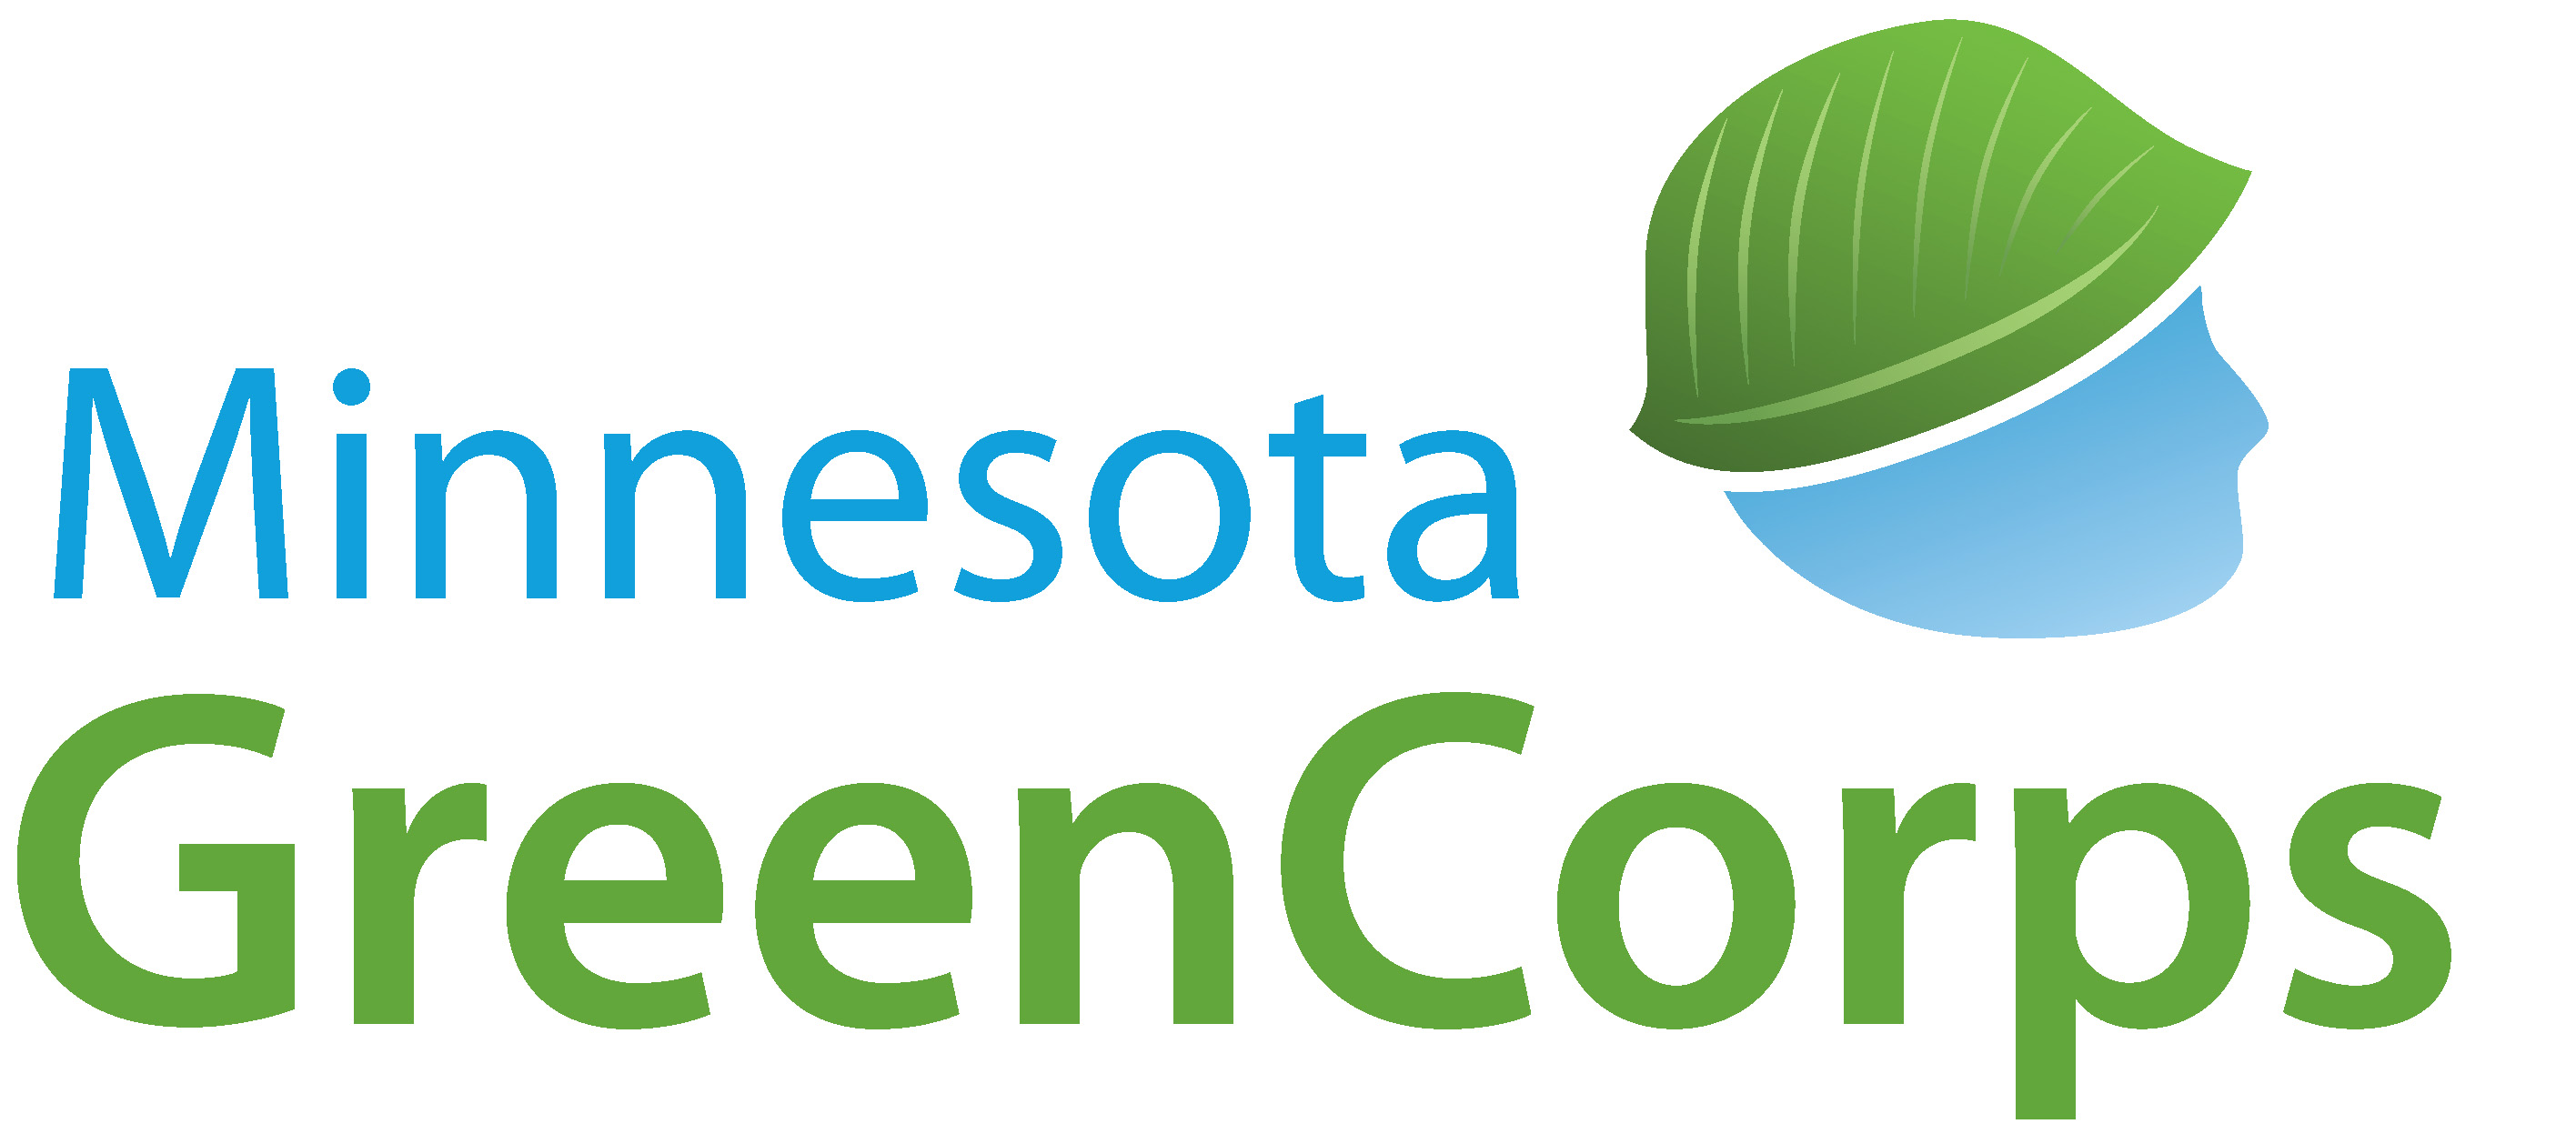 Minnesota GreenCorps AmeriCorps member